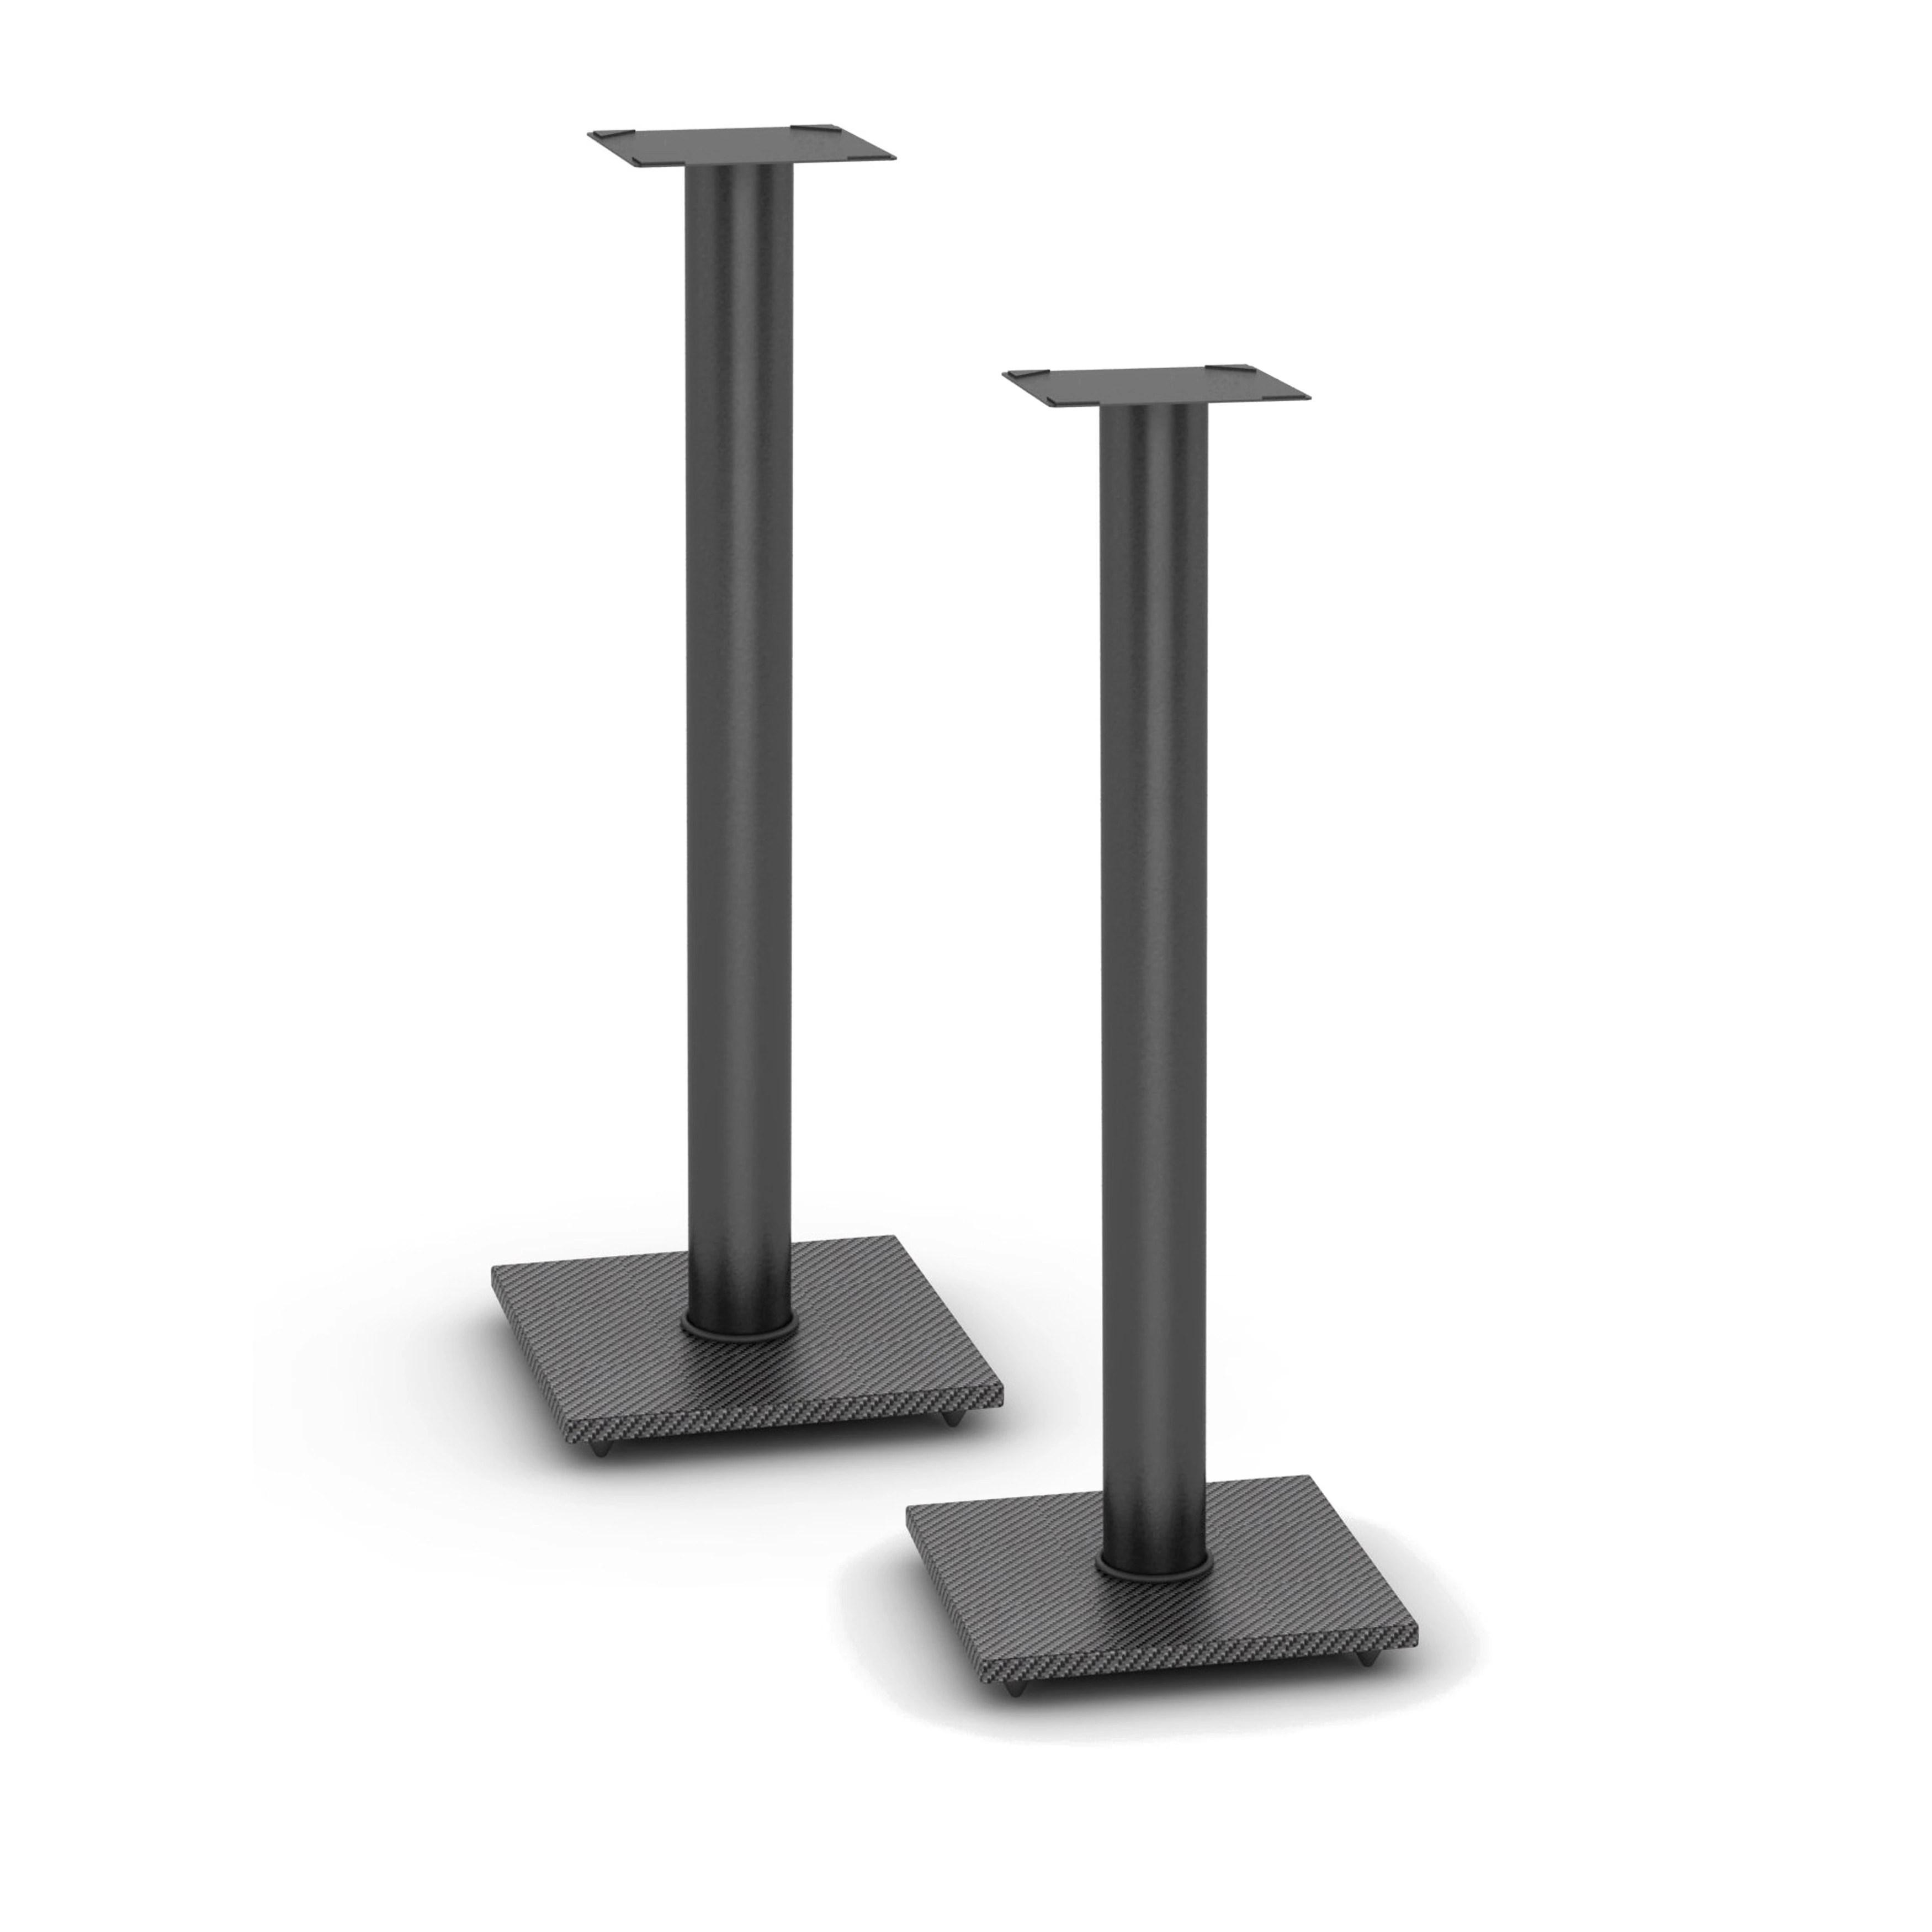 atlantic adjustable bookshelf black speaker stands (set of 2) - free